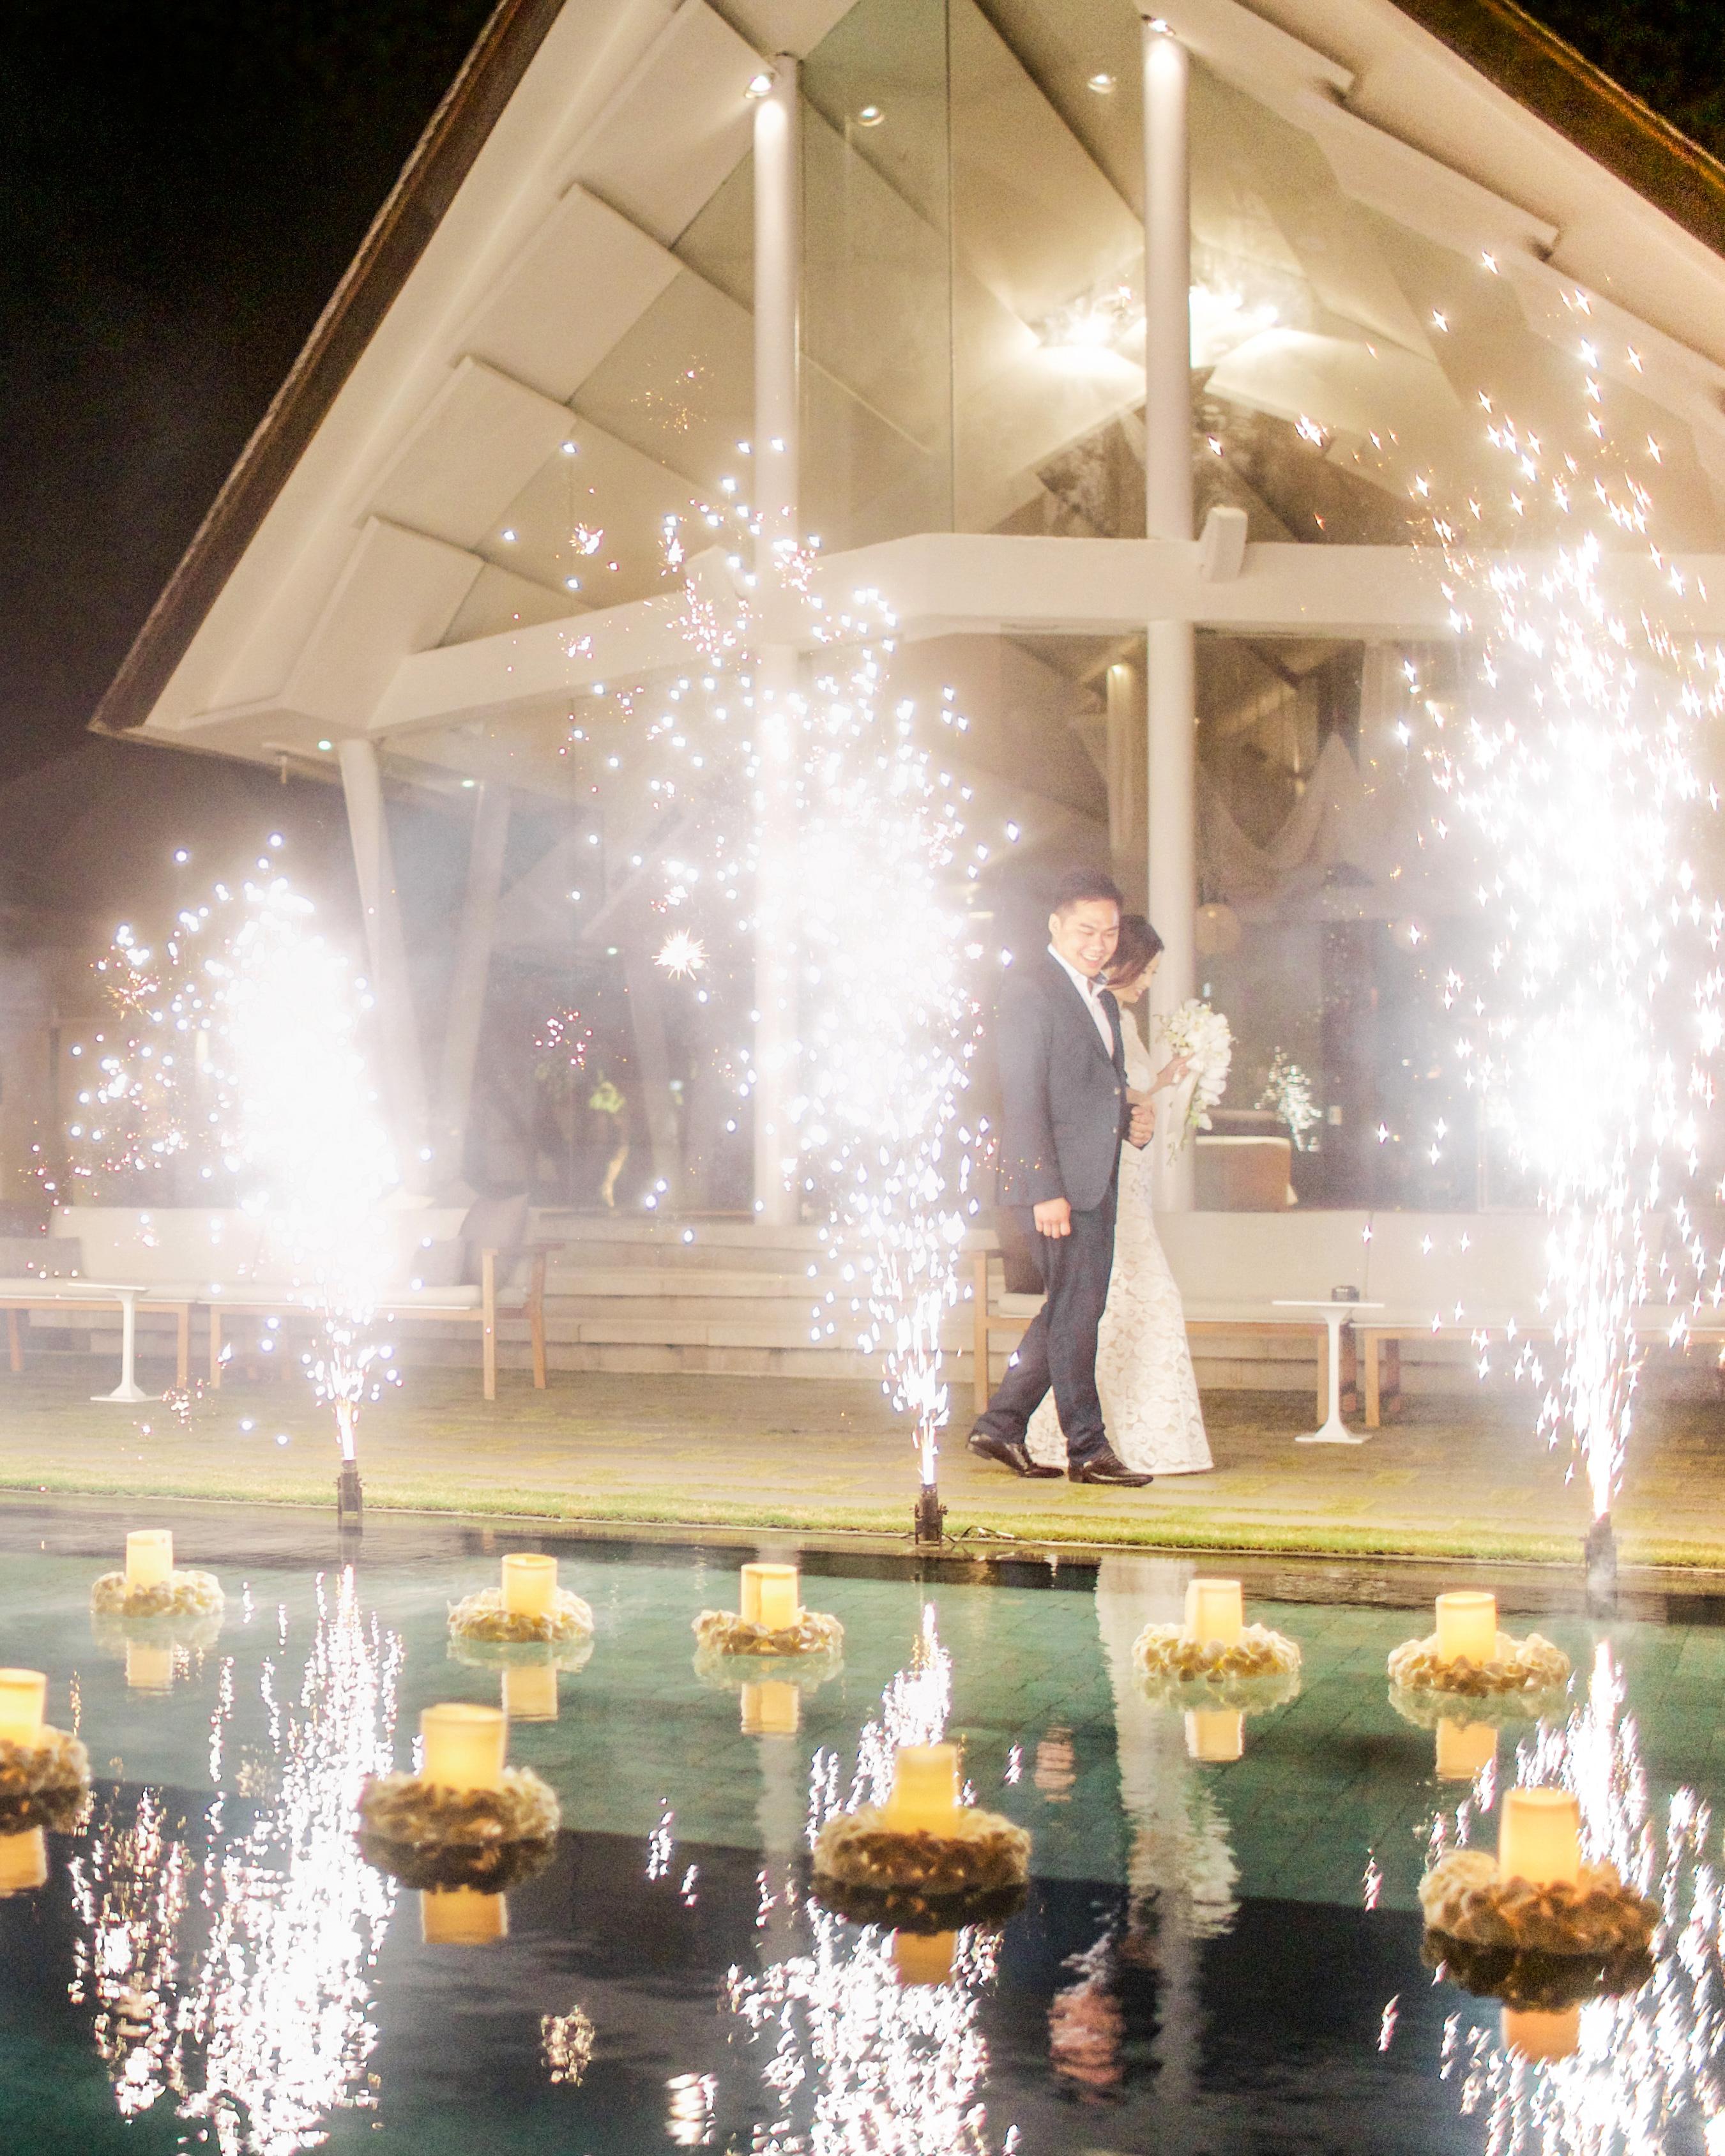 wedding fireworks sparkler dazzling reflection